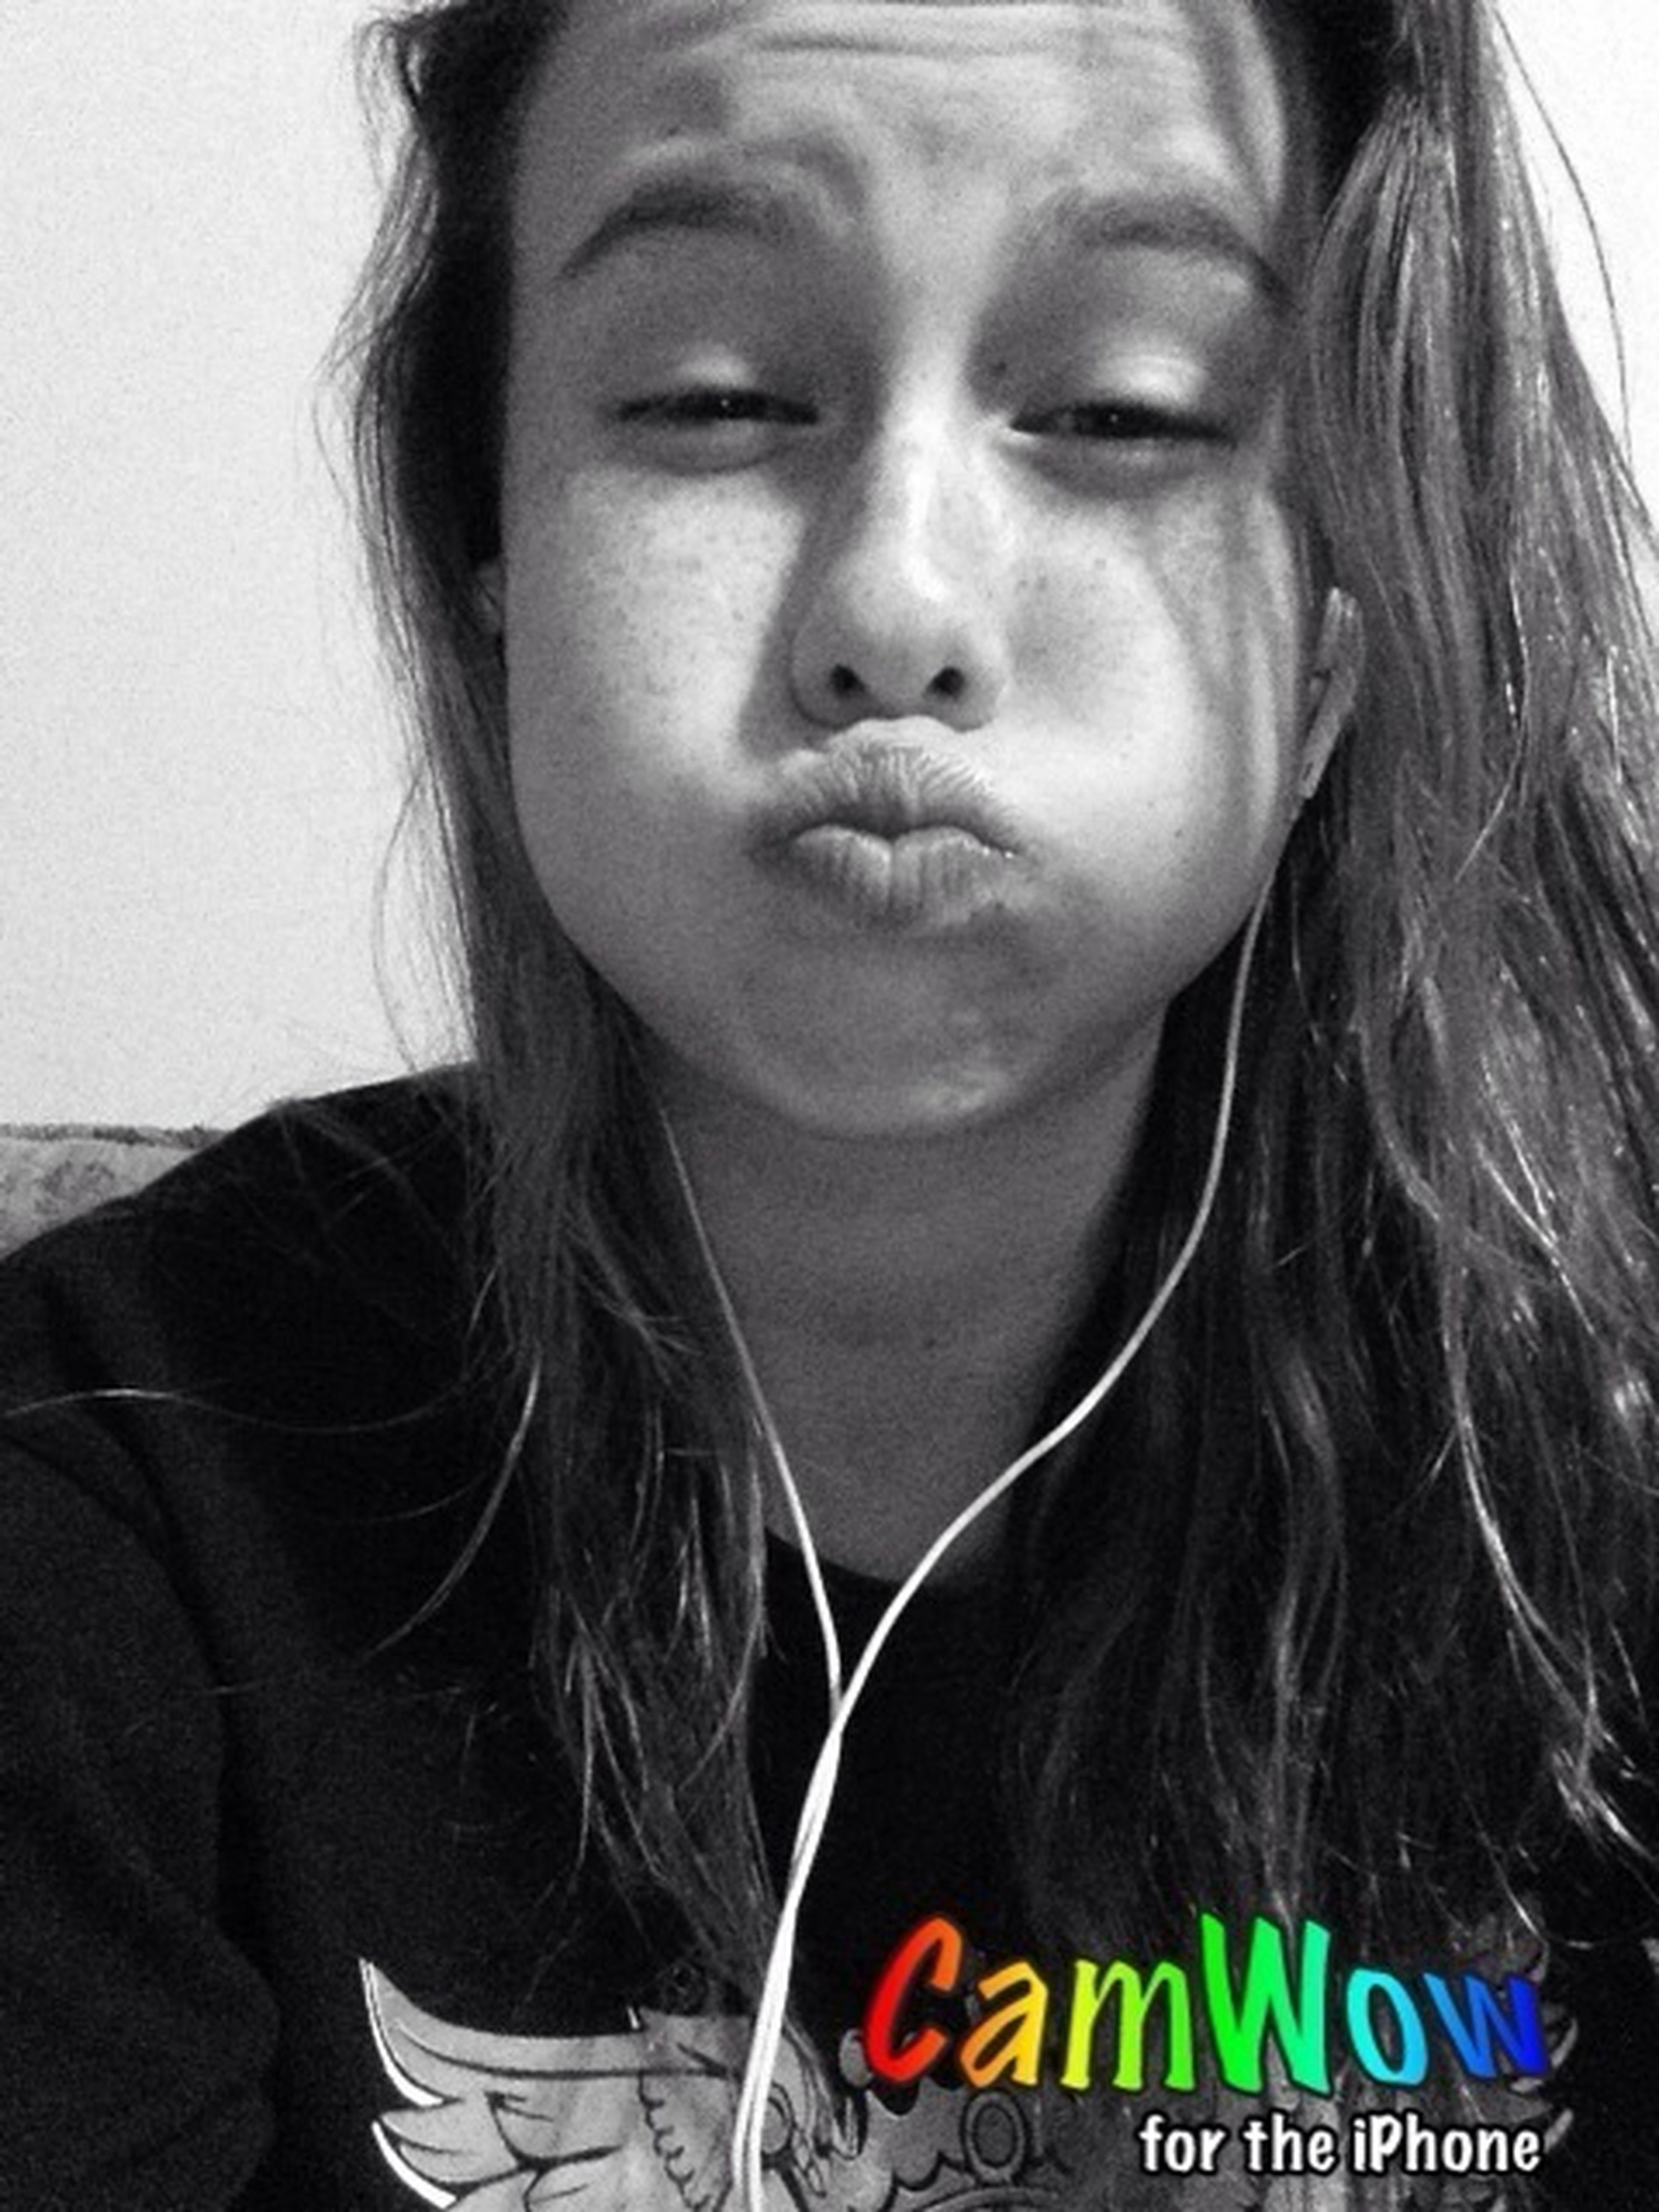 What I Do When Im Bored #dontjudge